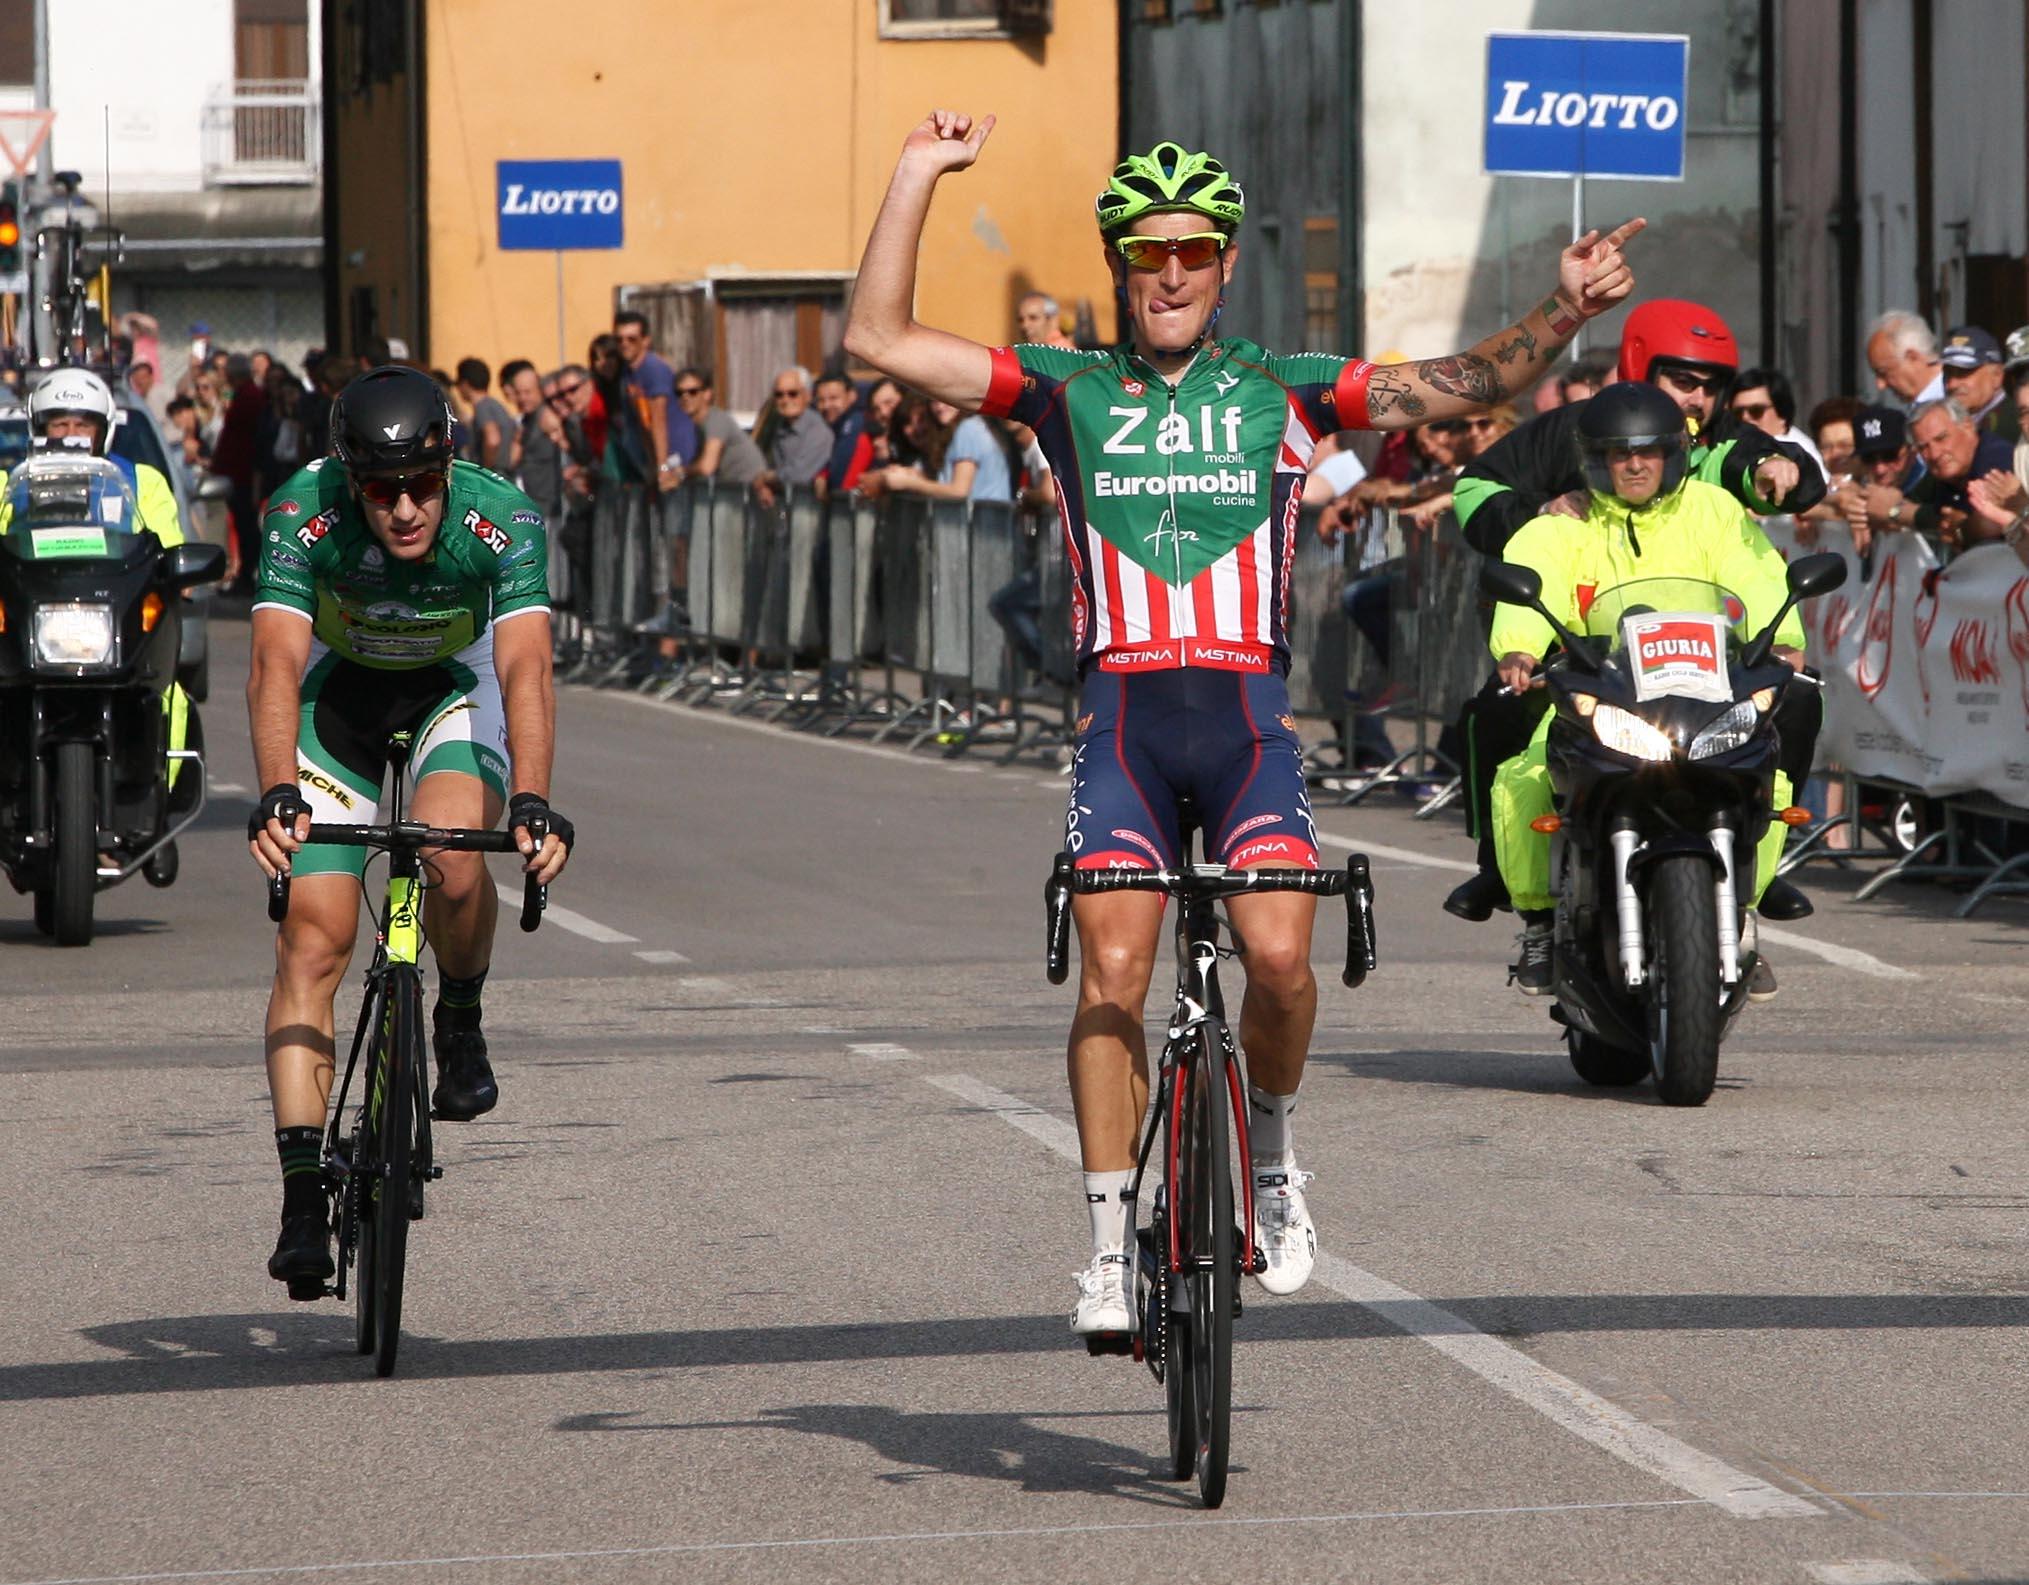 La vittoria di Gaggia a Roncolevà